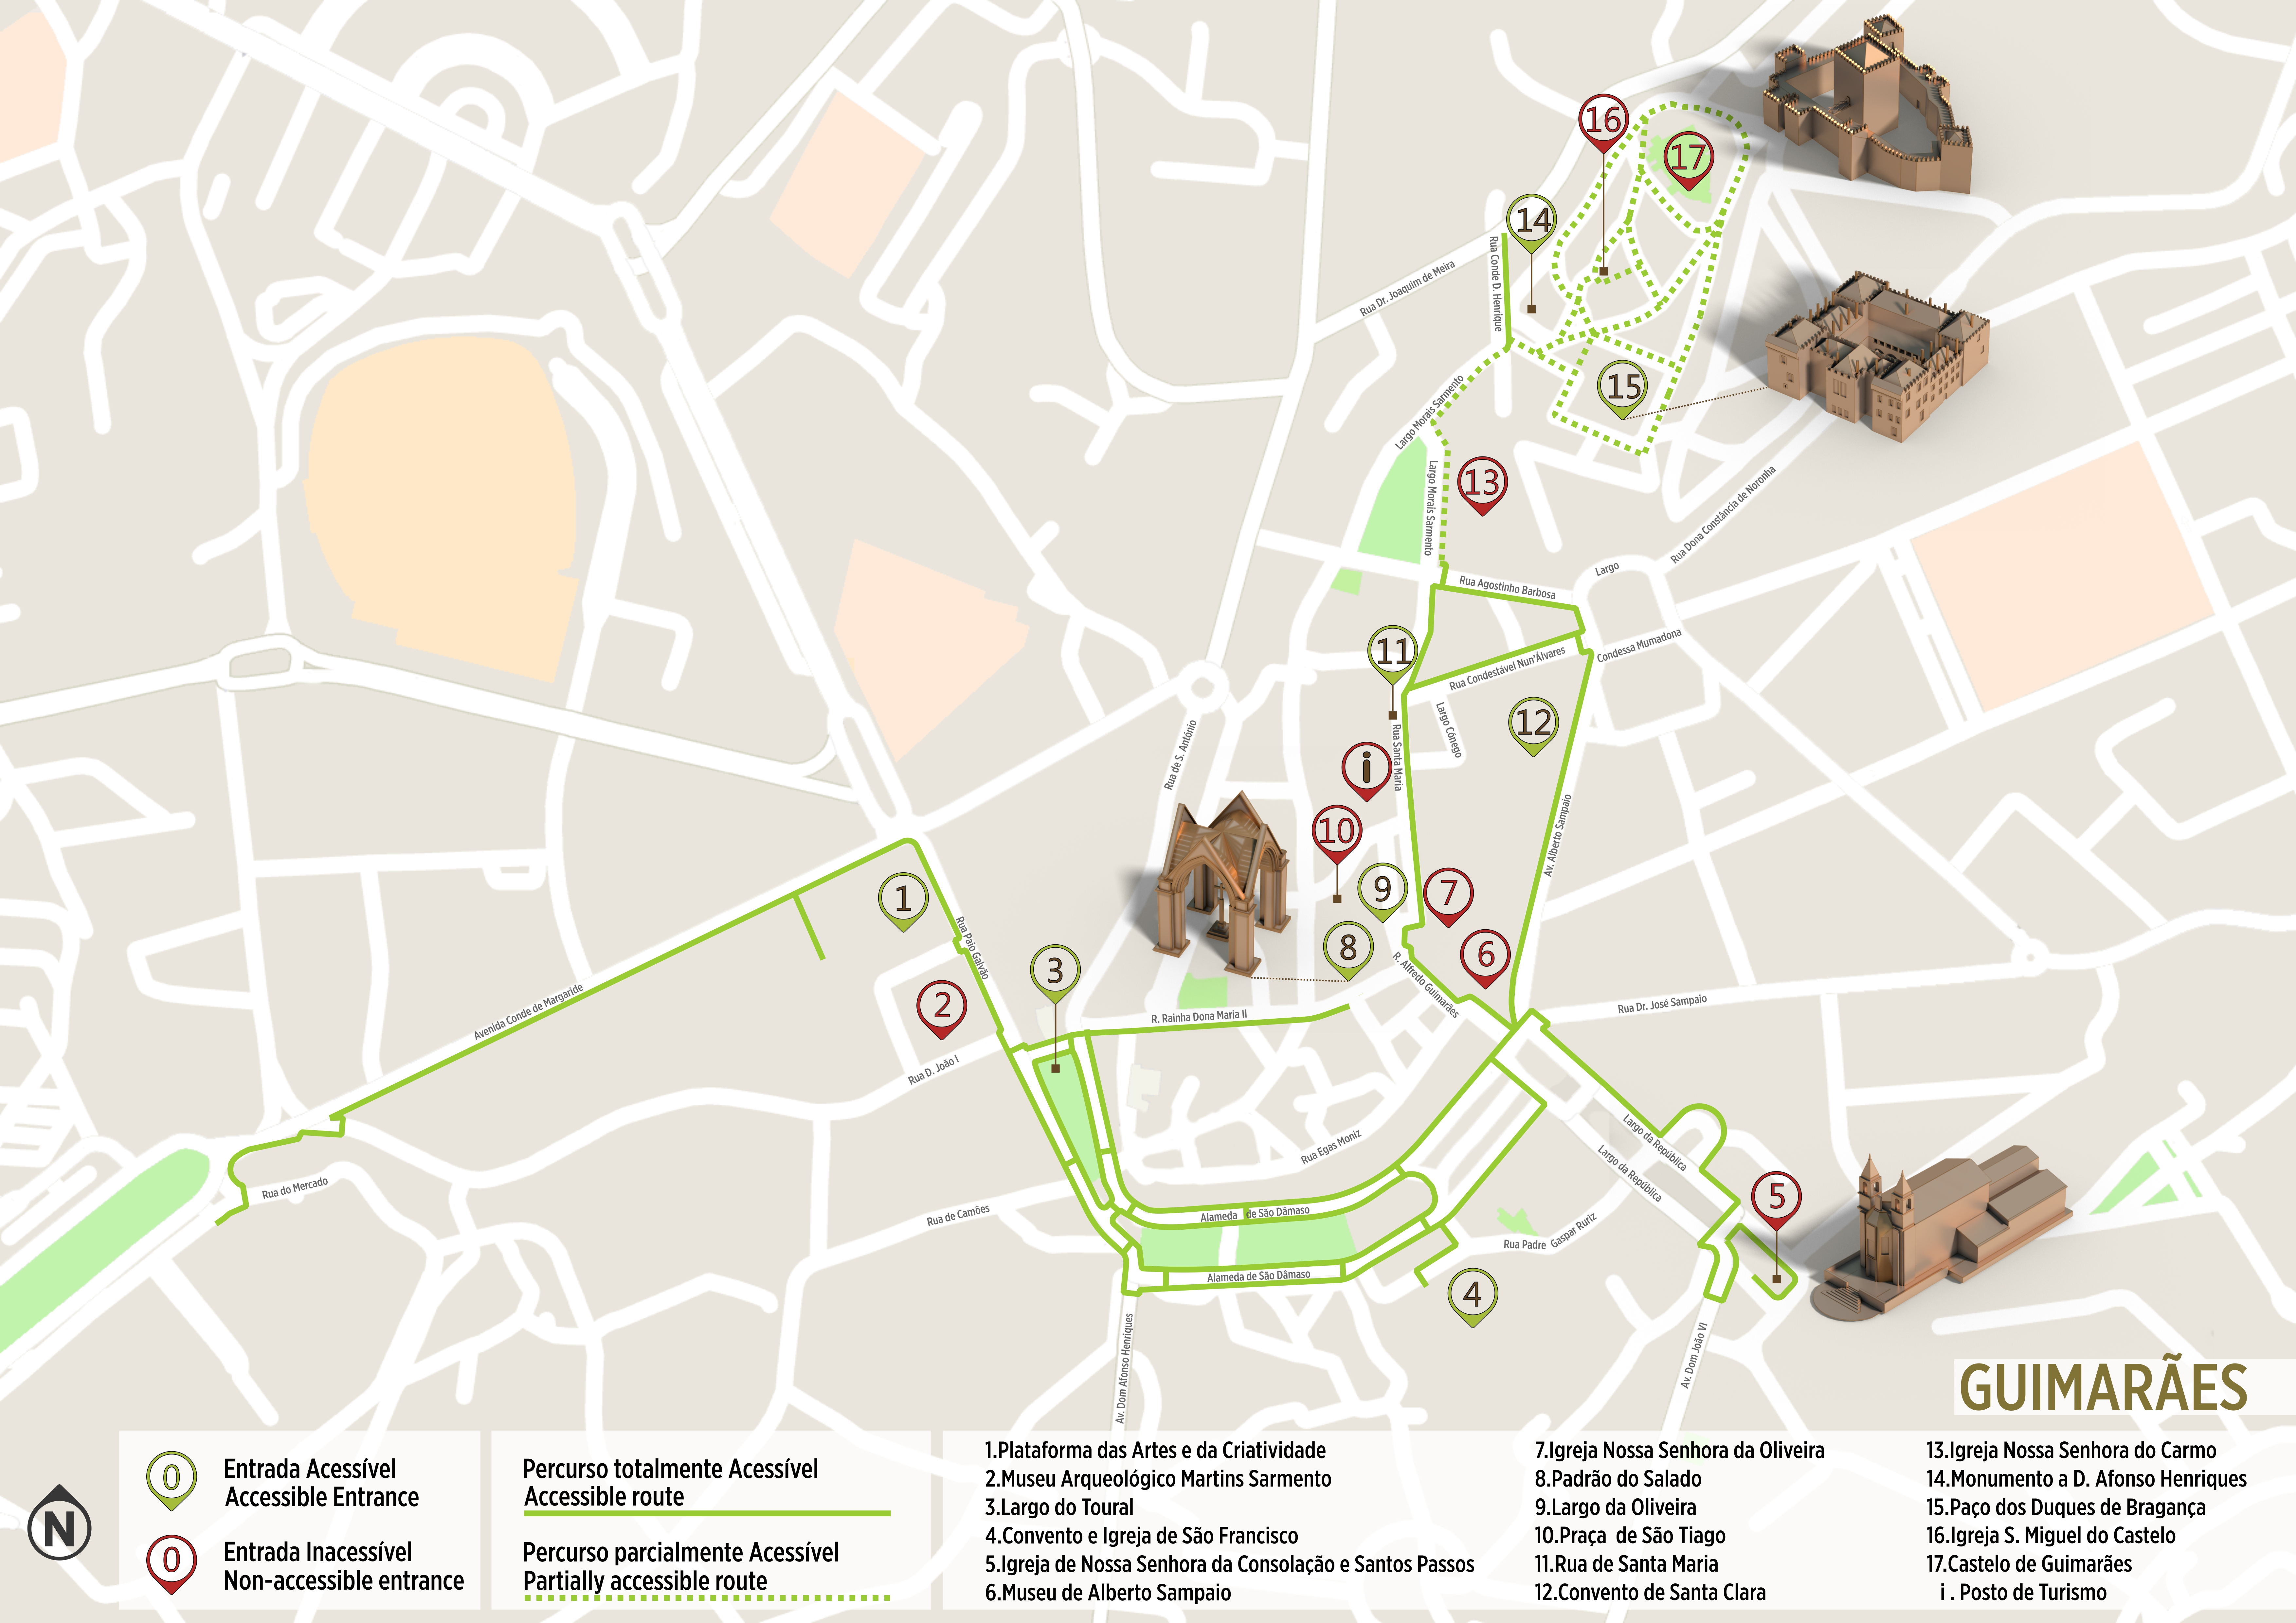 avenida da igreja lisboa mapa Guimarães   Accessible tour | .visitportugal.com avenida da igreja lisboa mapa